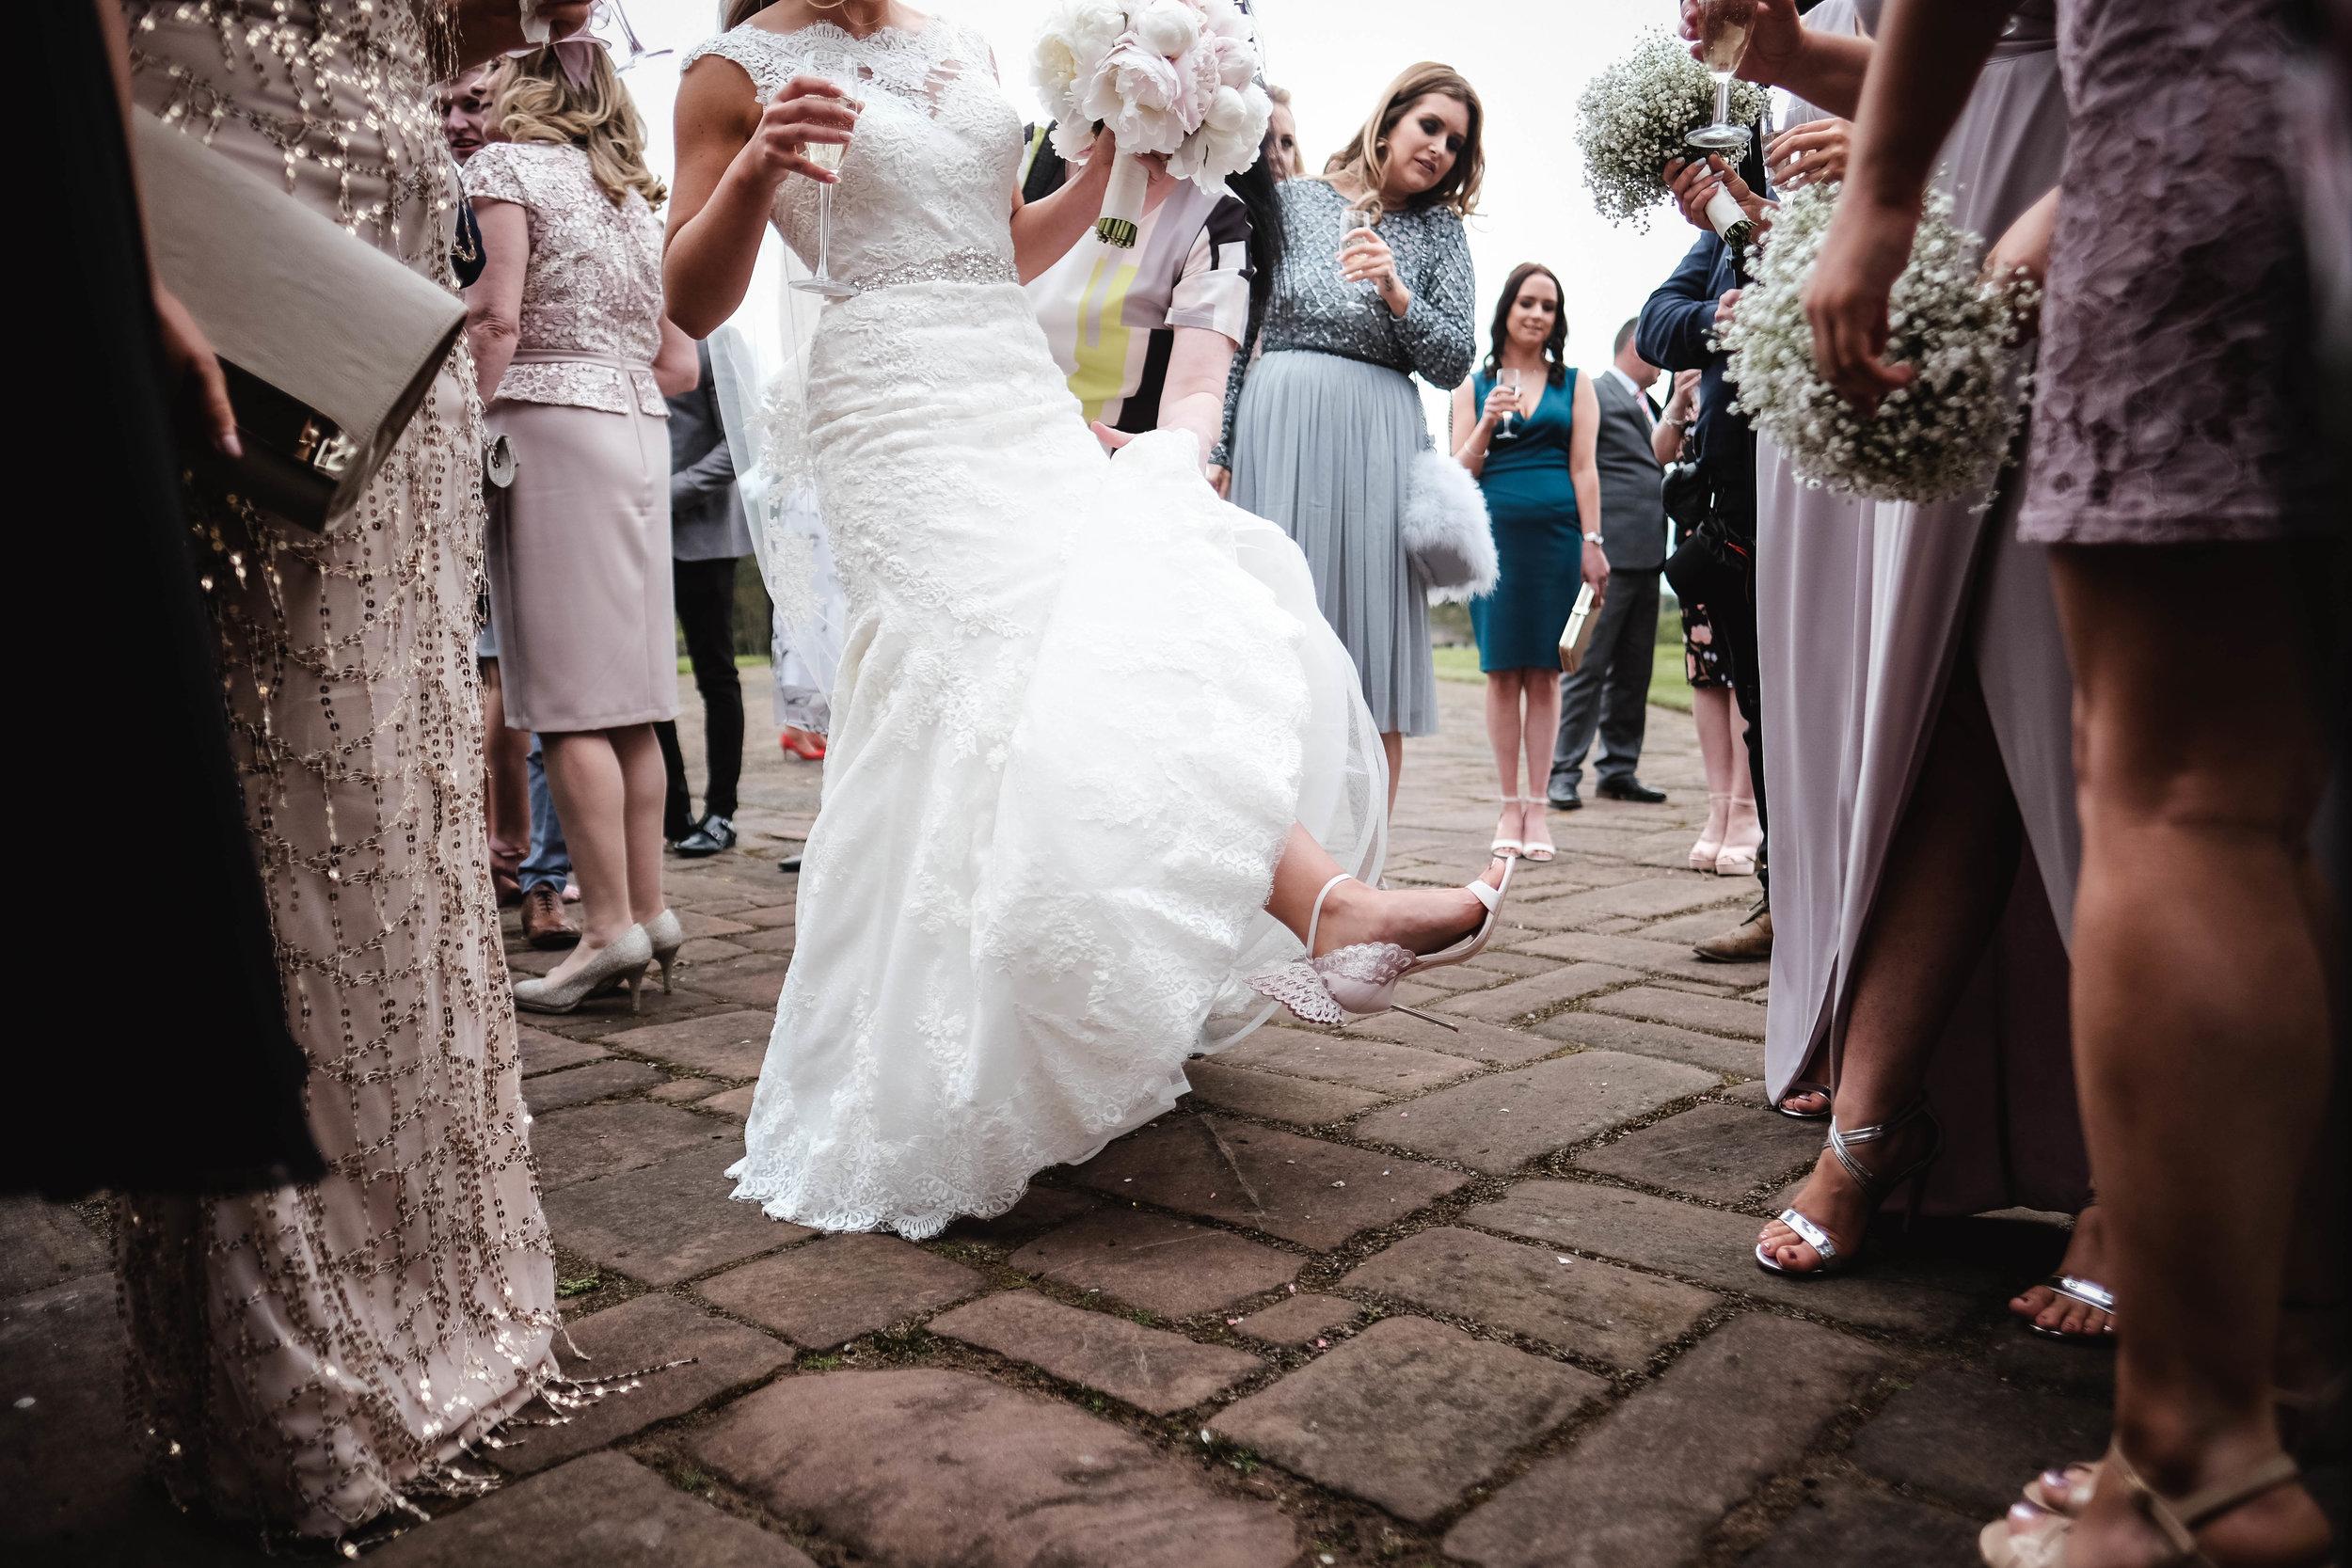 Thornton manor wedding photography cheshire wedding photographer liverpool manchester warrington chester wirral wedding BLOG (47 of 108).jpg